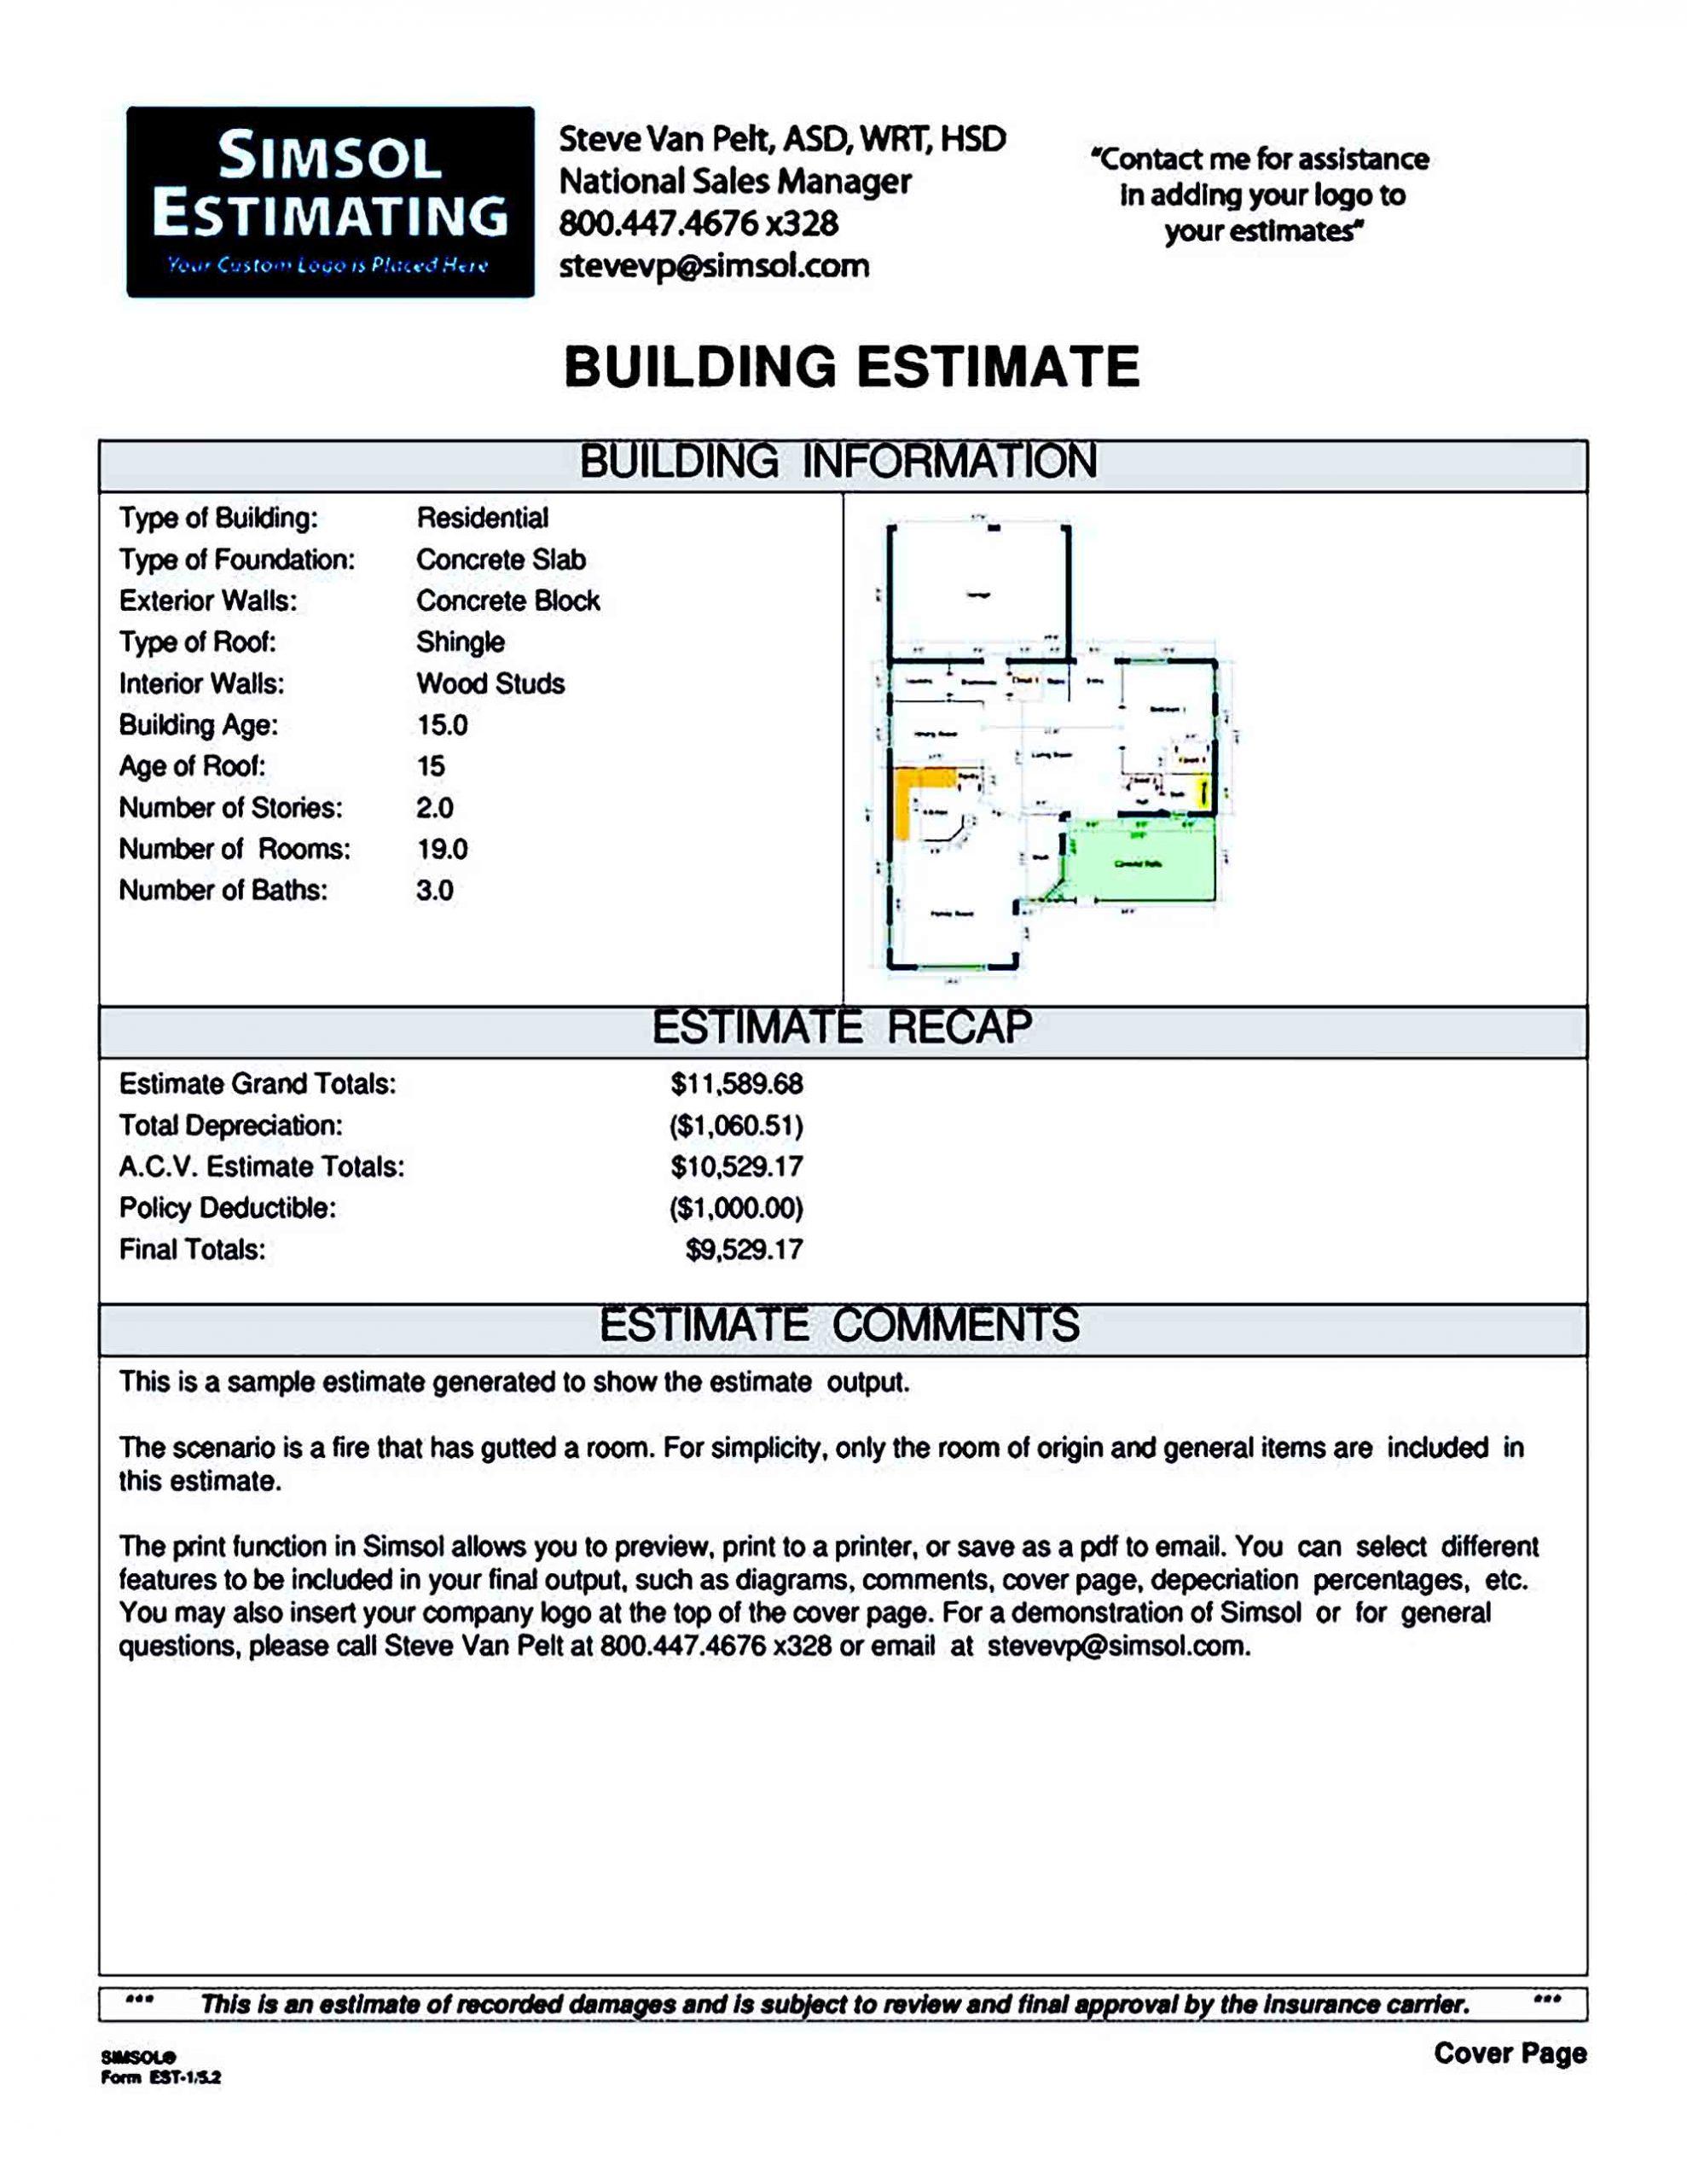 Sample Simsol Building Construction Estimate 1 788x1020 1